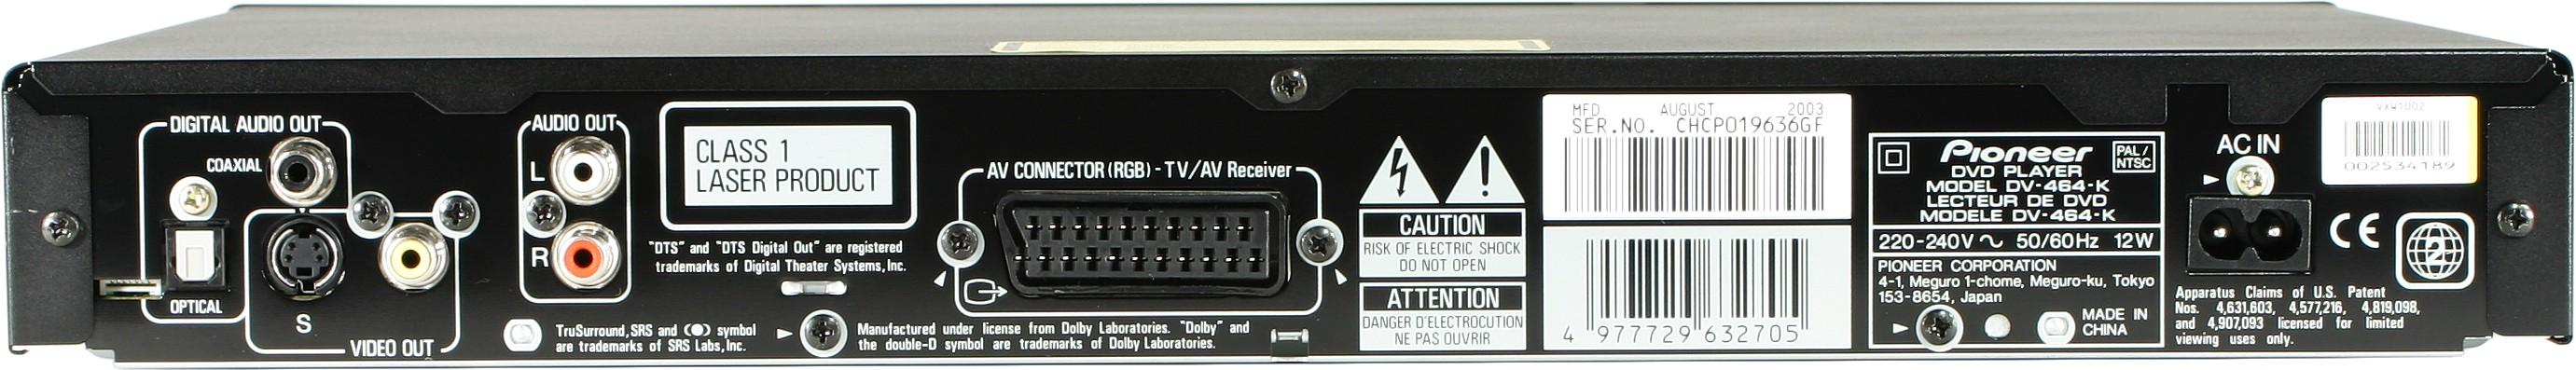 Распиновка Rgb Pioneer